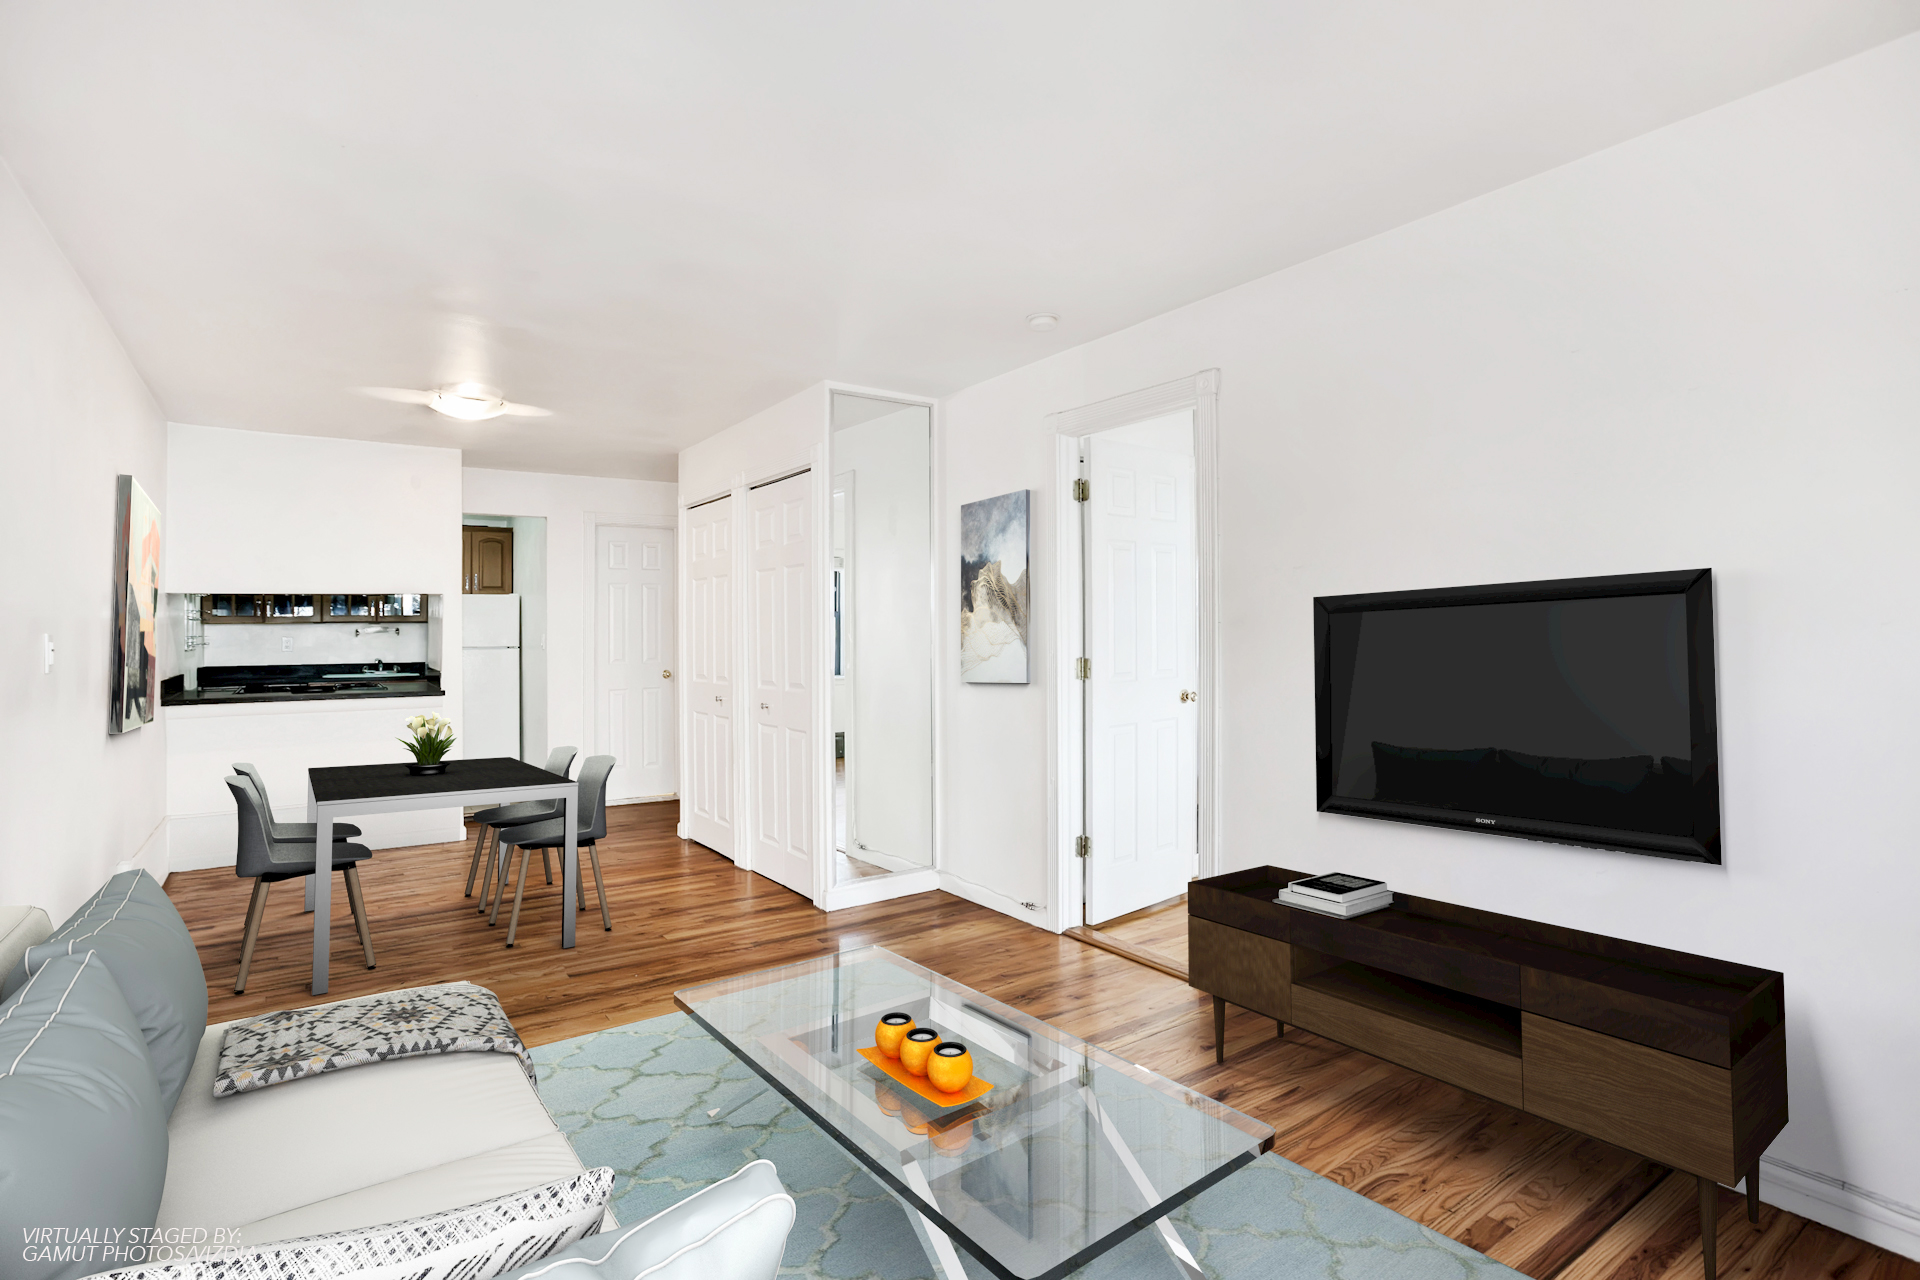 424 West 49th Street, #3A - $850,000